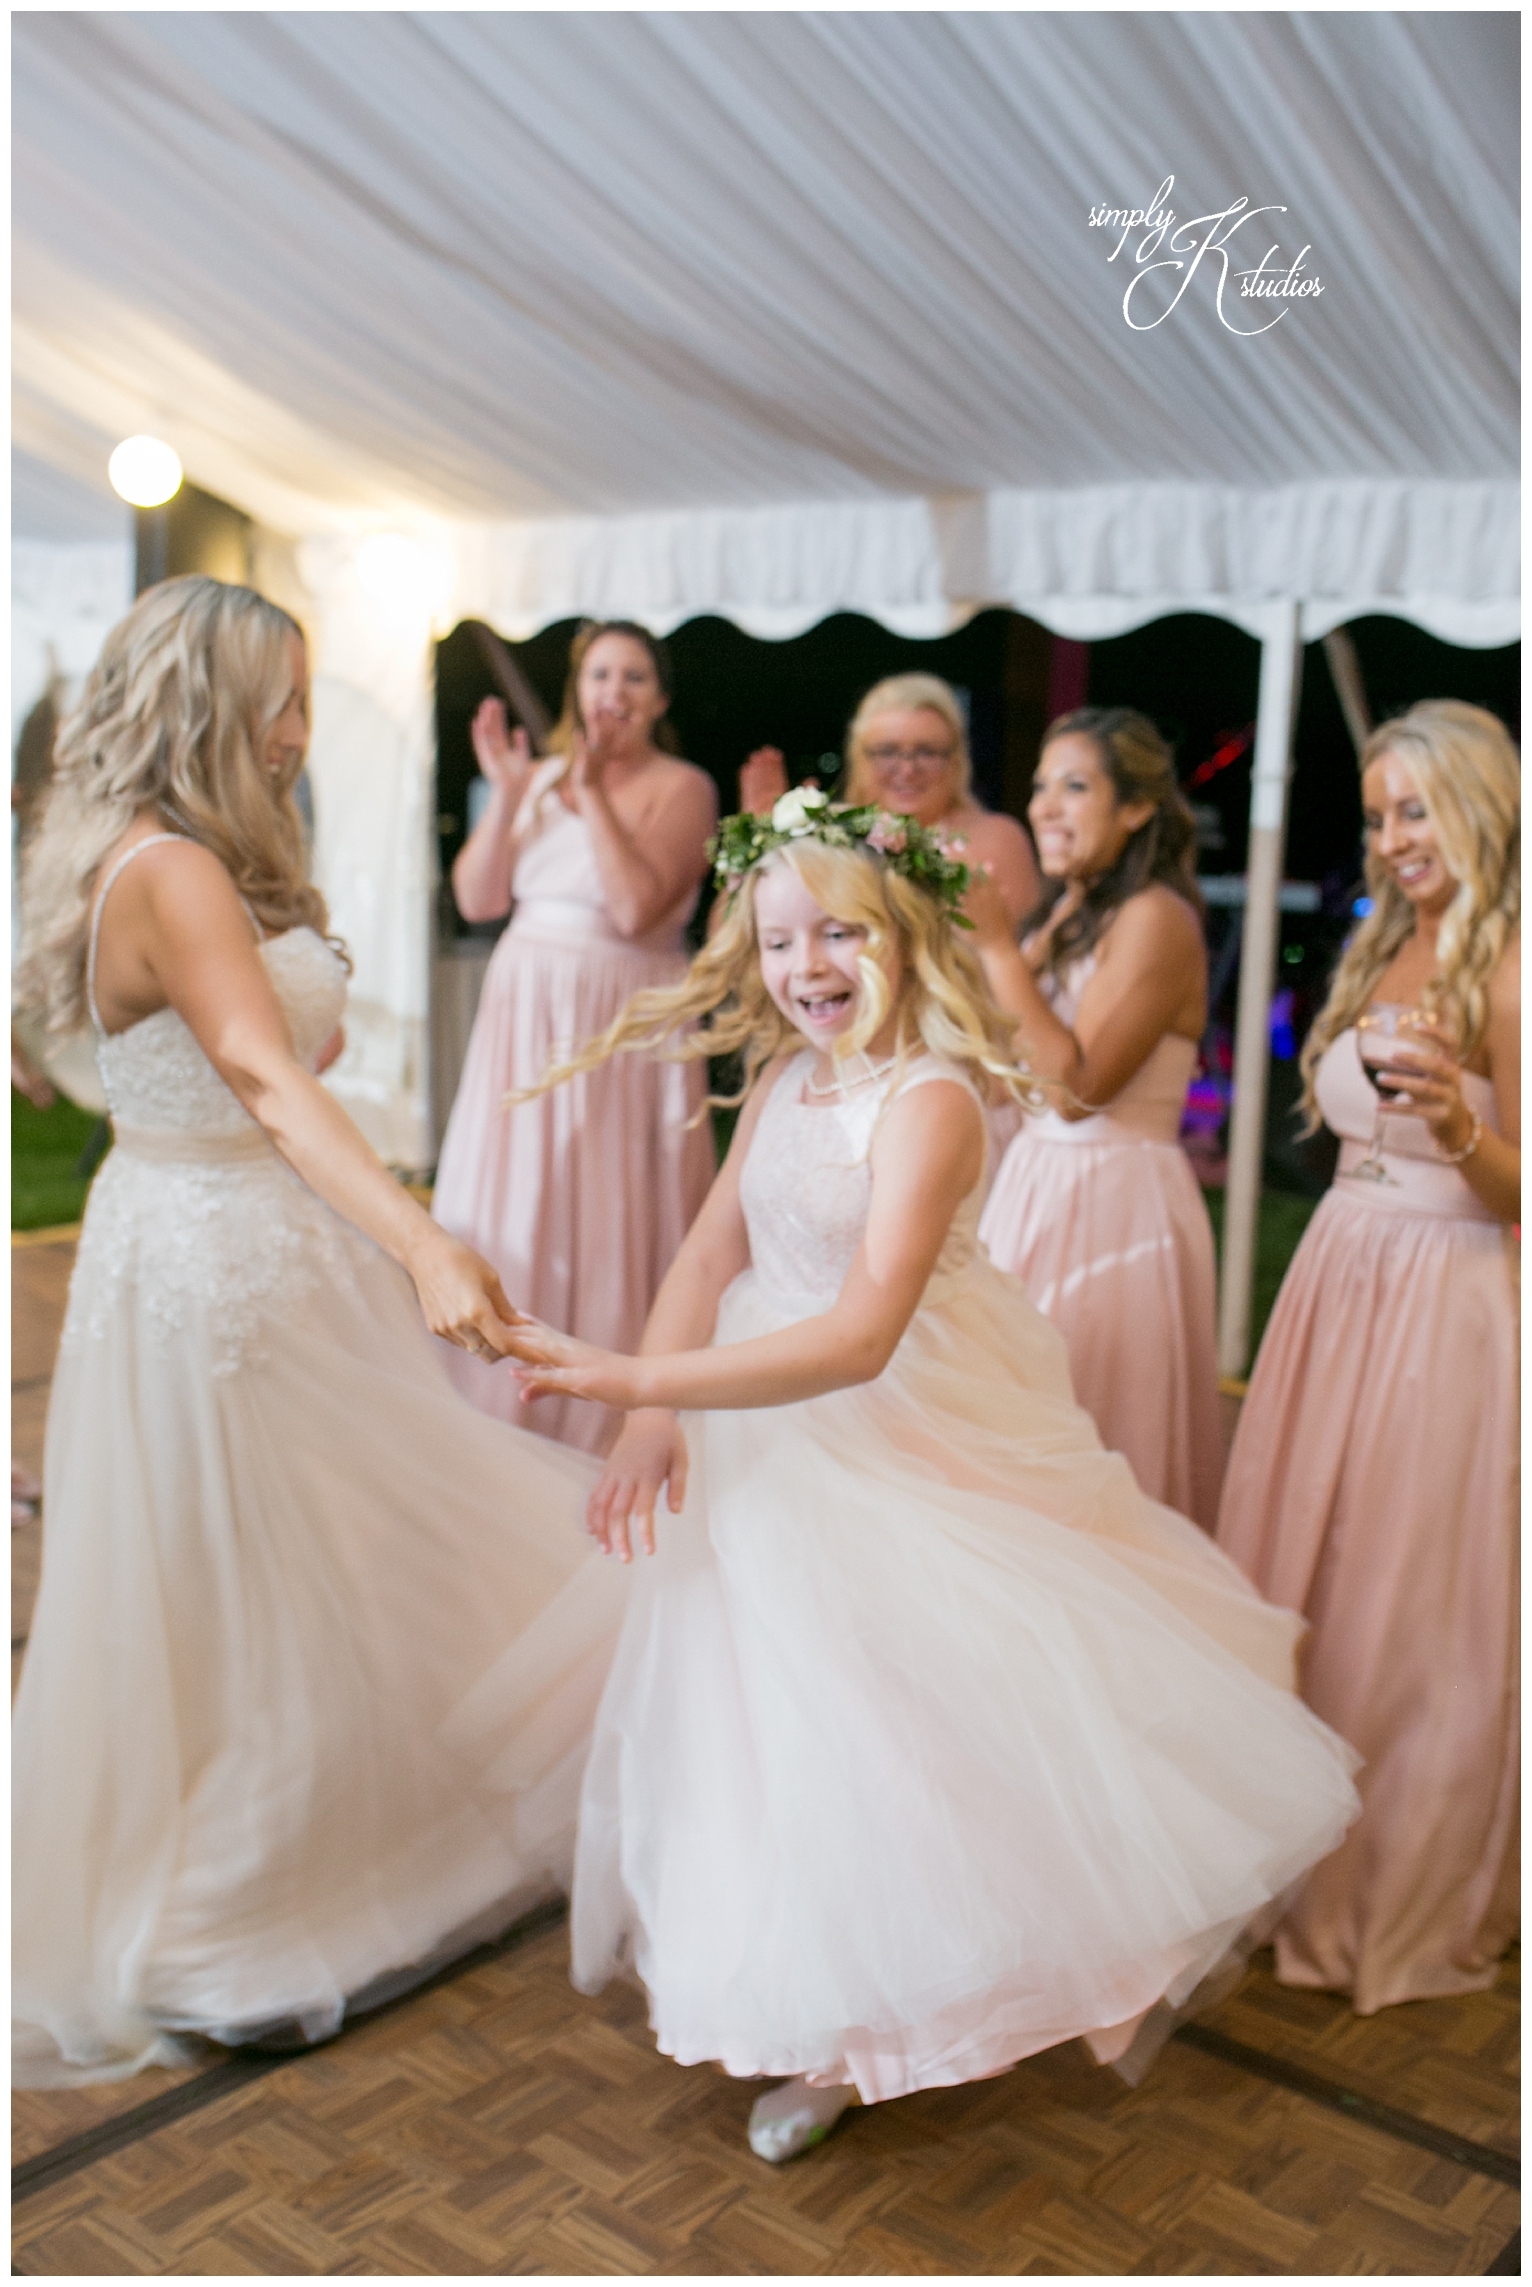 Candid Wedding Photos in CT.jpg